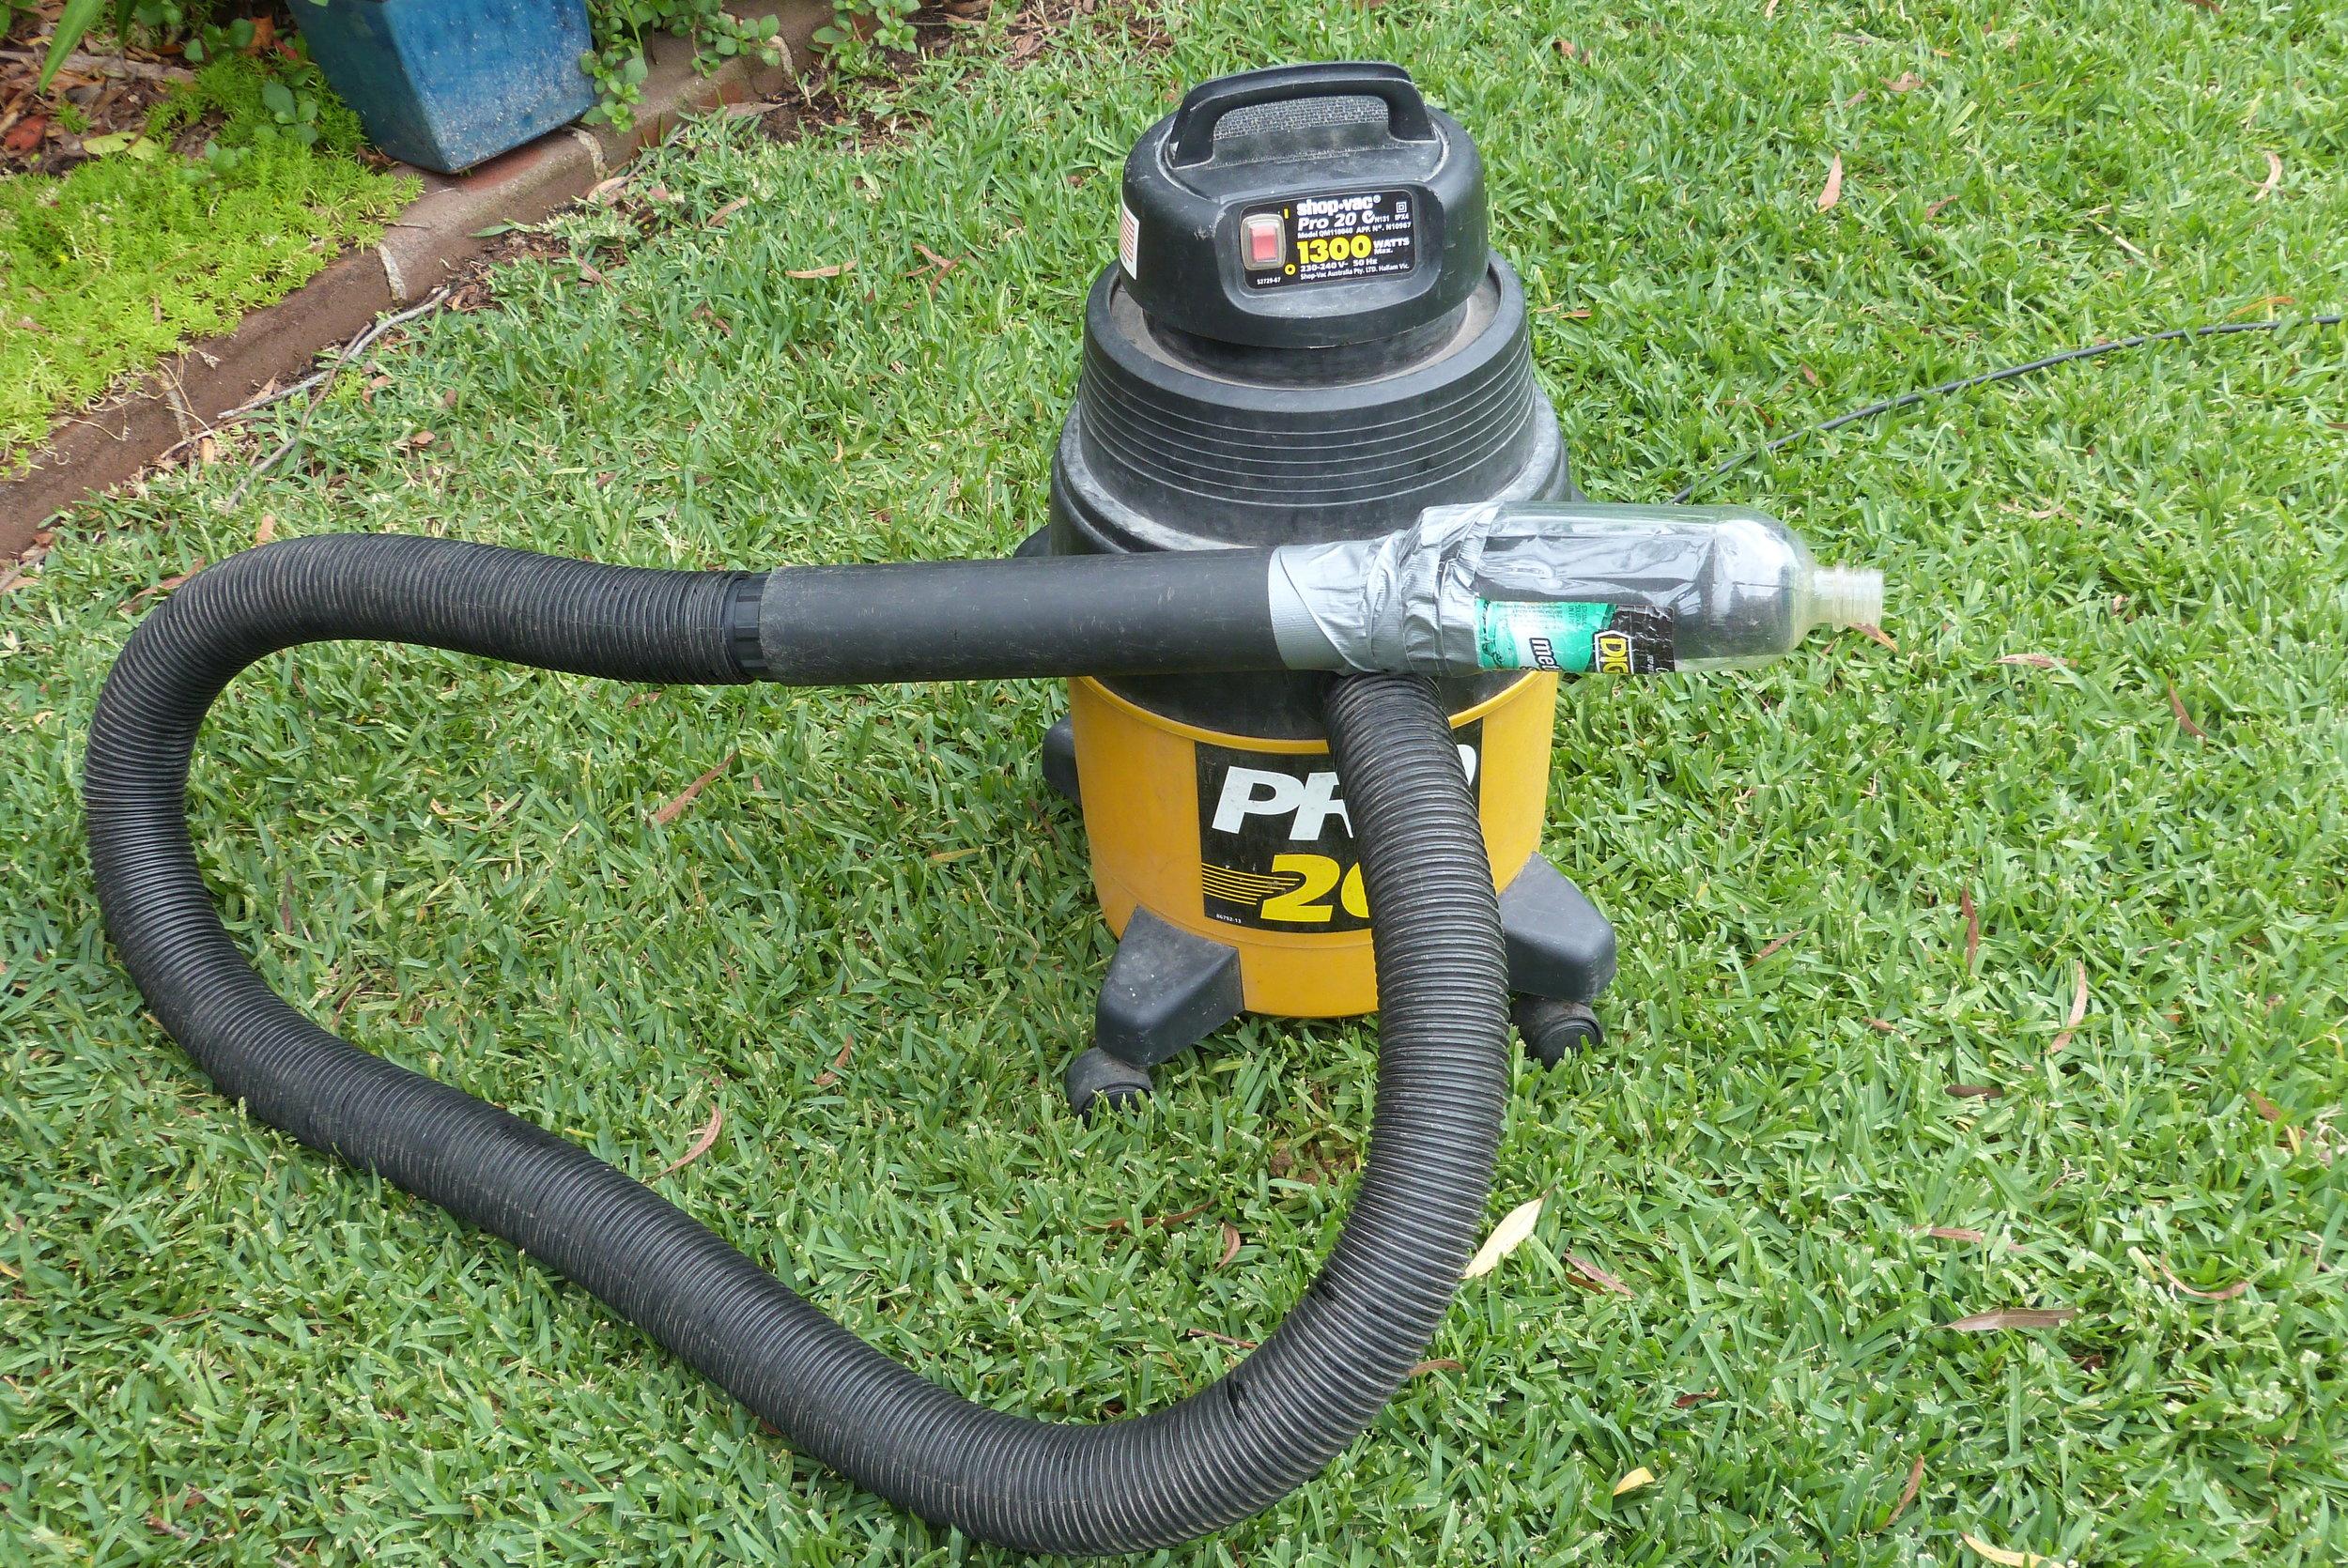 Modified Vacuum Cleaner